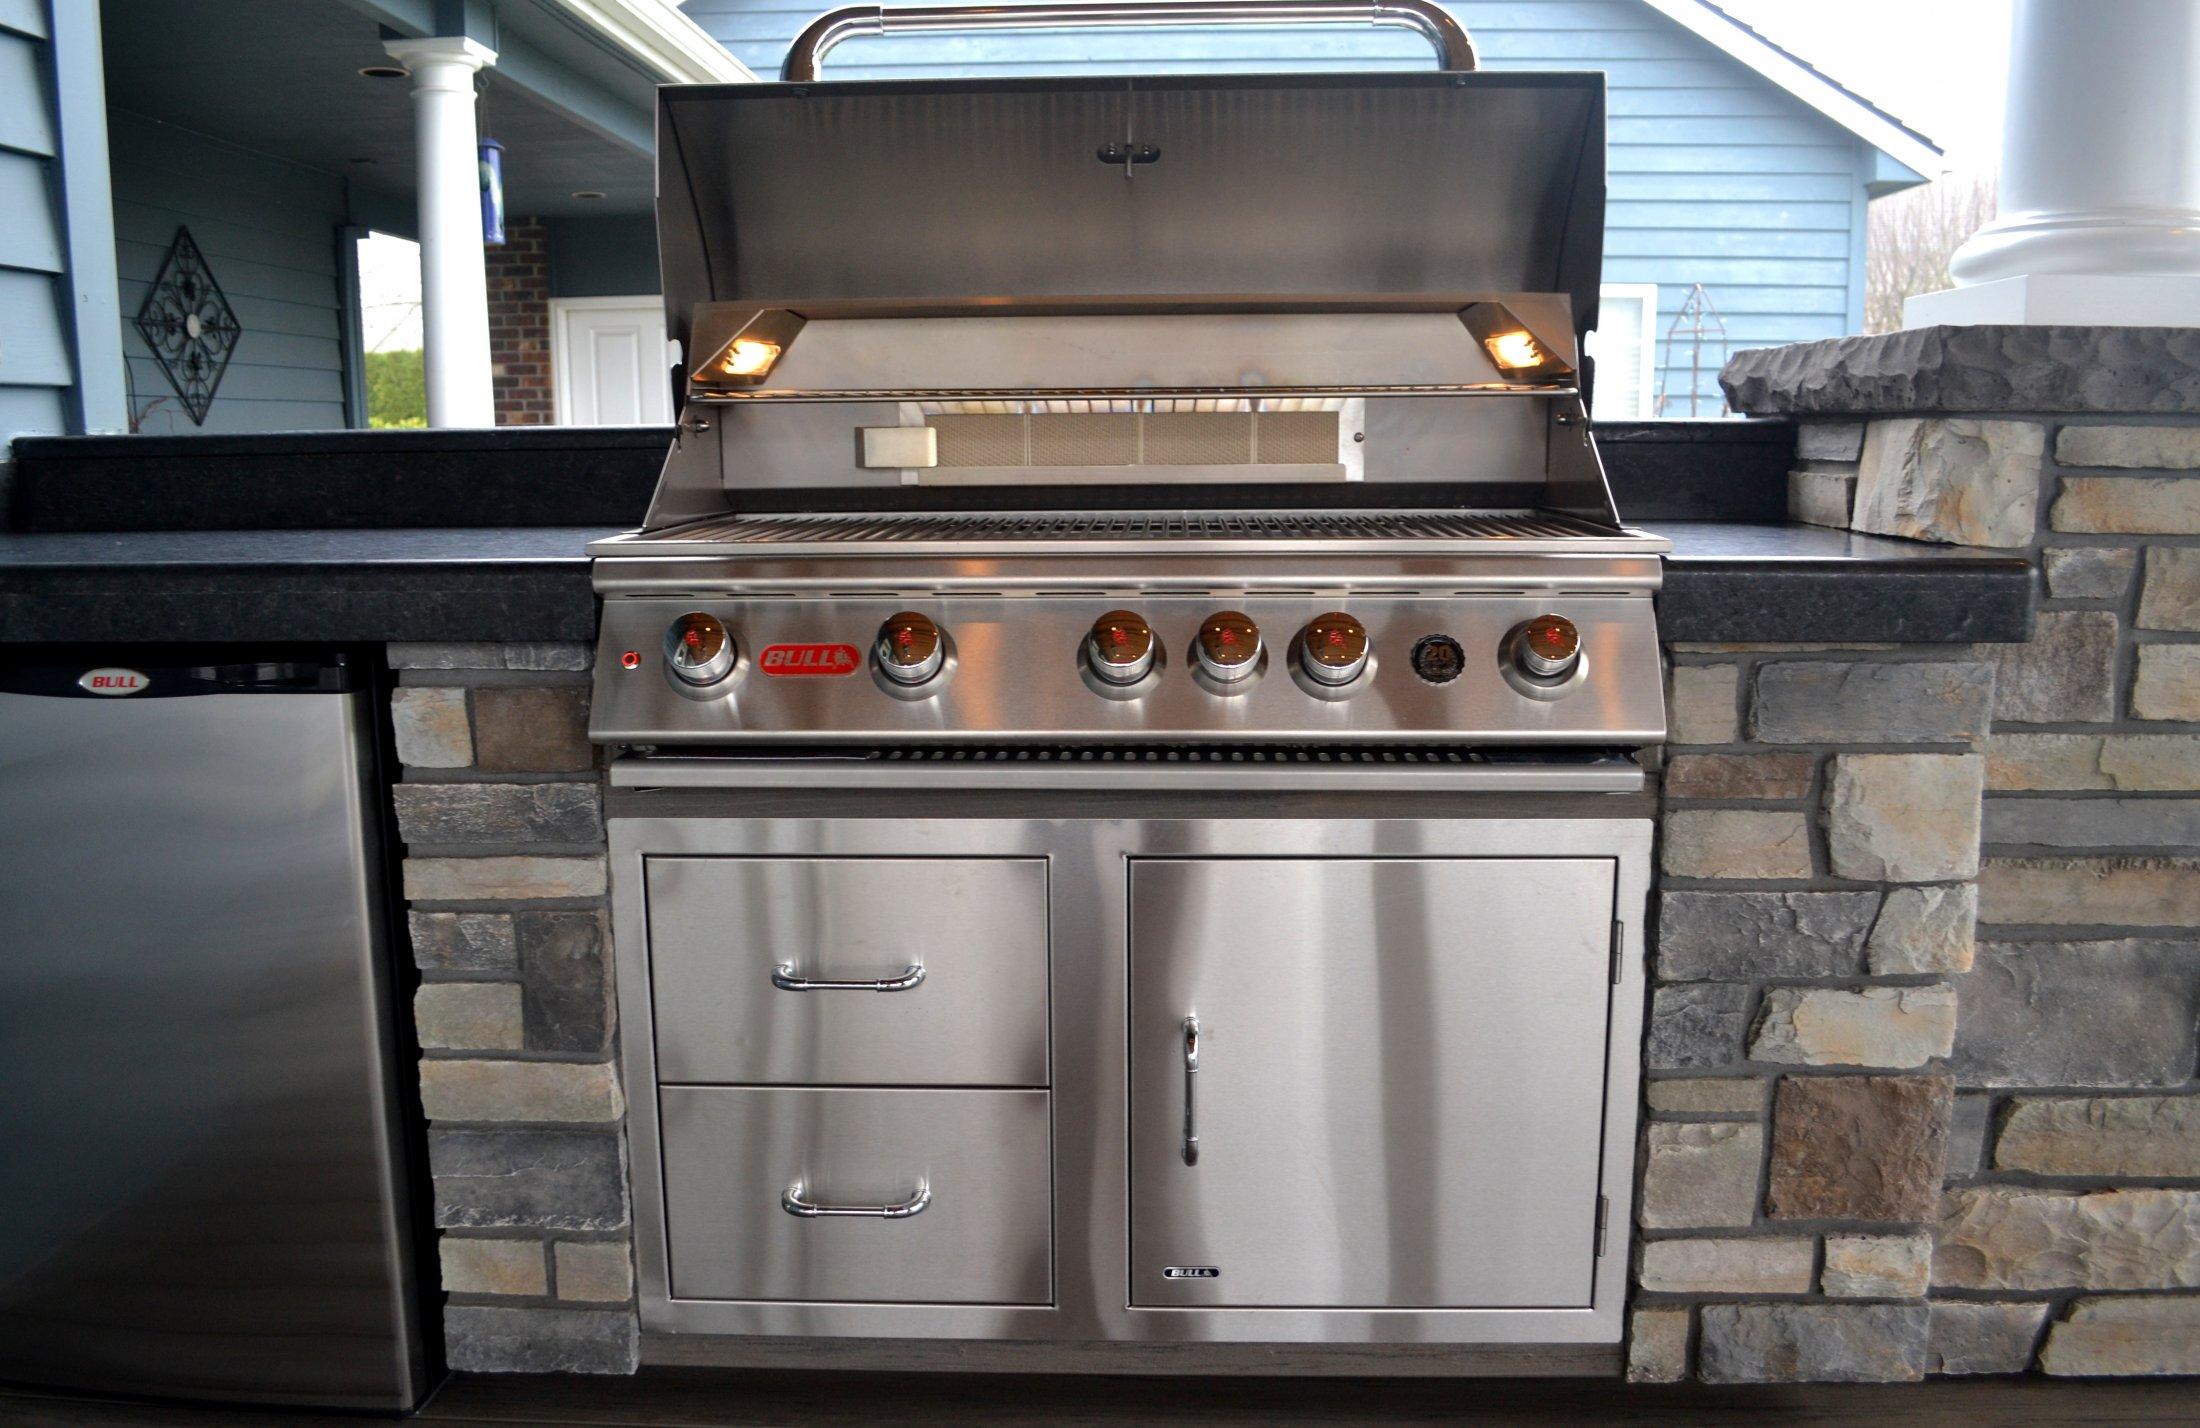 Outdoor Kitchen with BBQ, Fridge, Concrete Slab Countertops